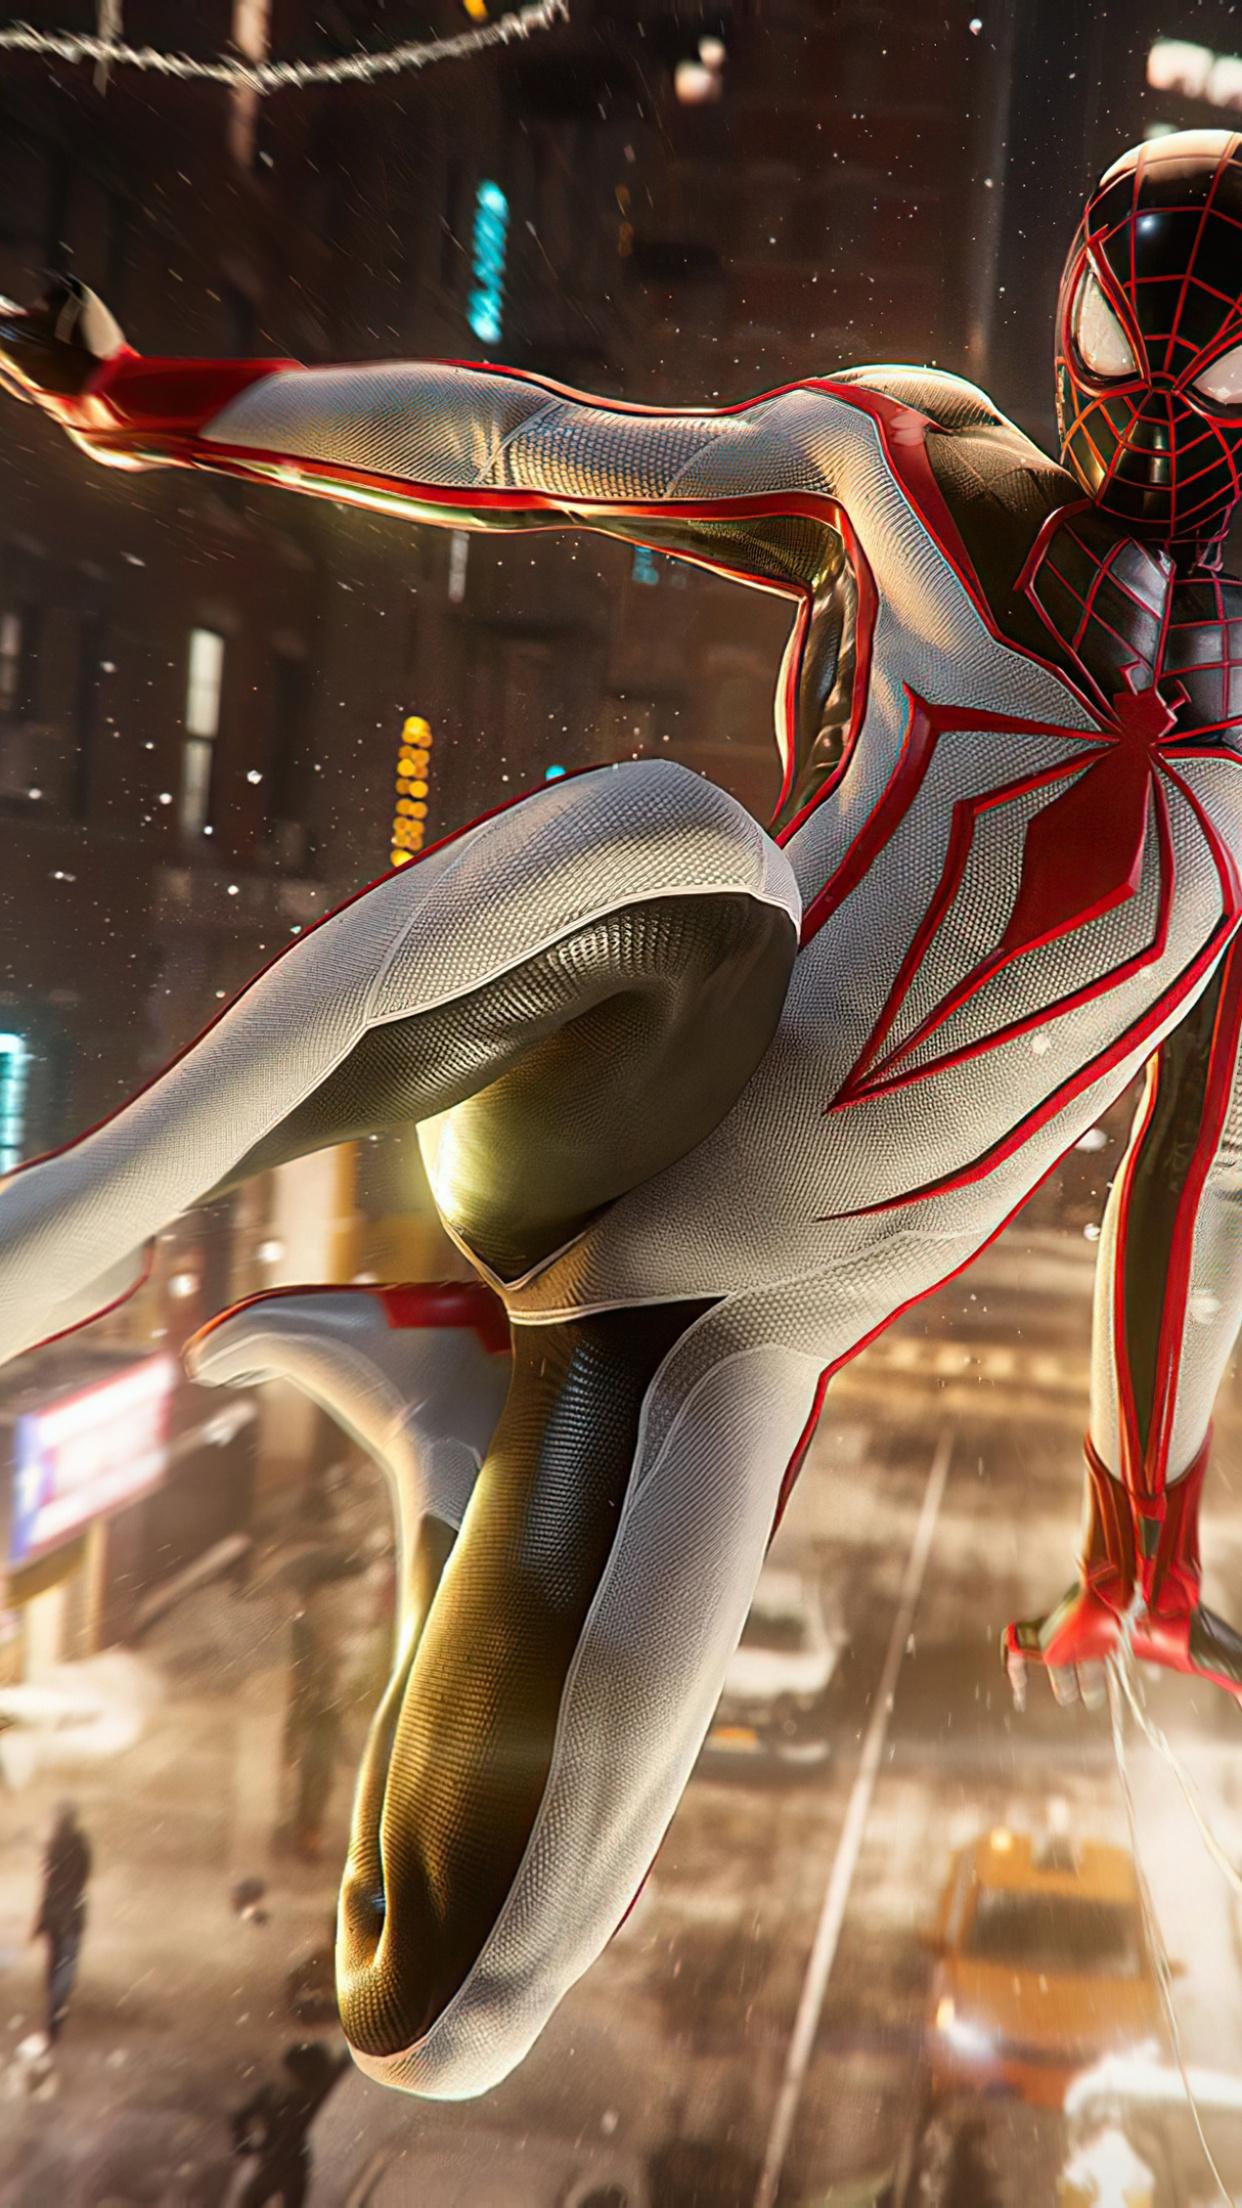 Marvel S Spider Man Miles Morales 4k Wallpaper Playstation 5 2020 Games Games 3111